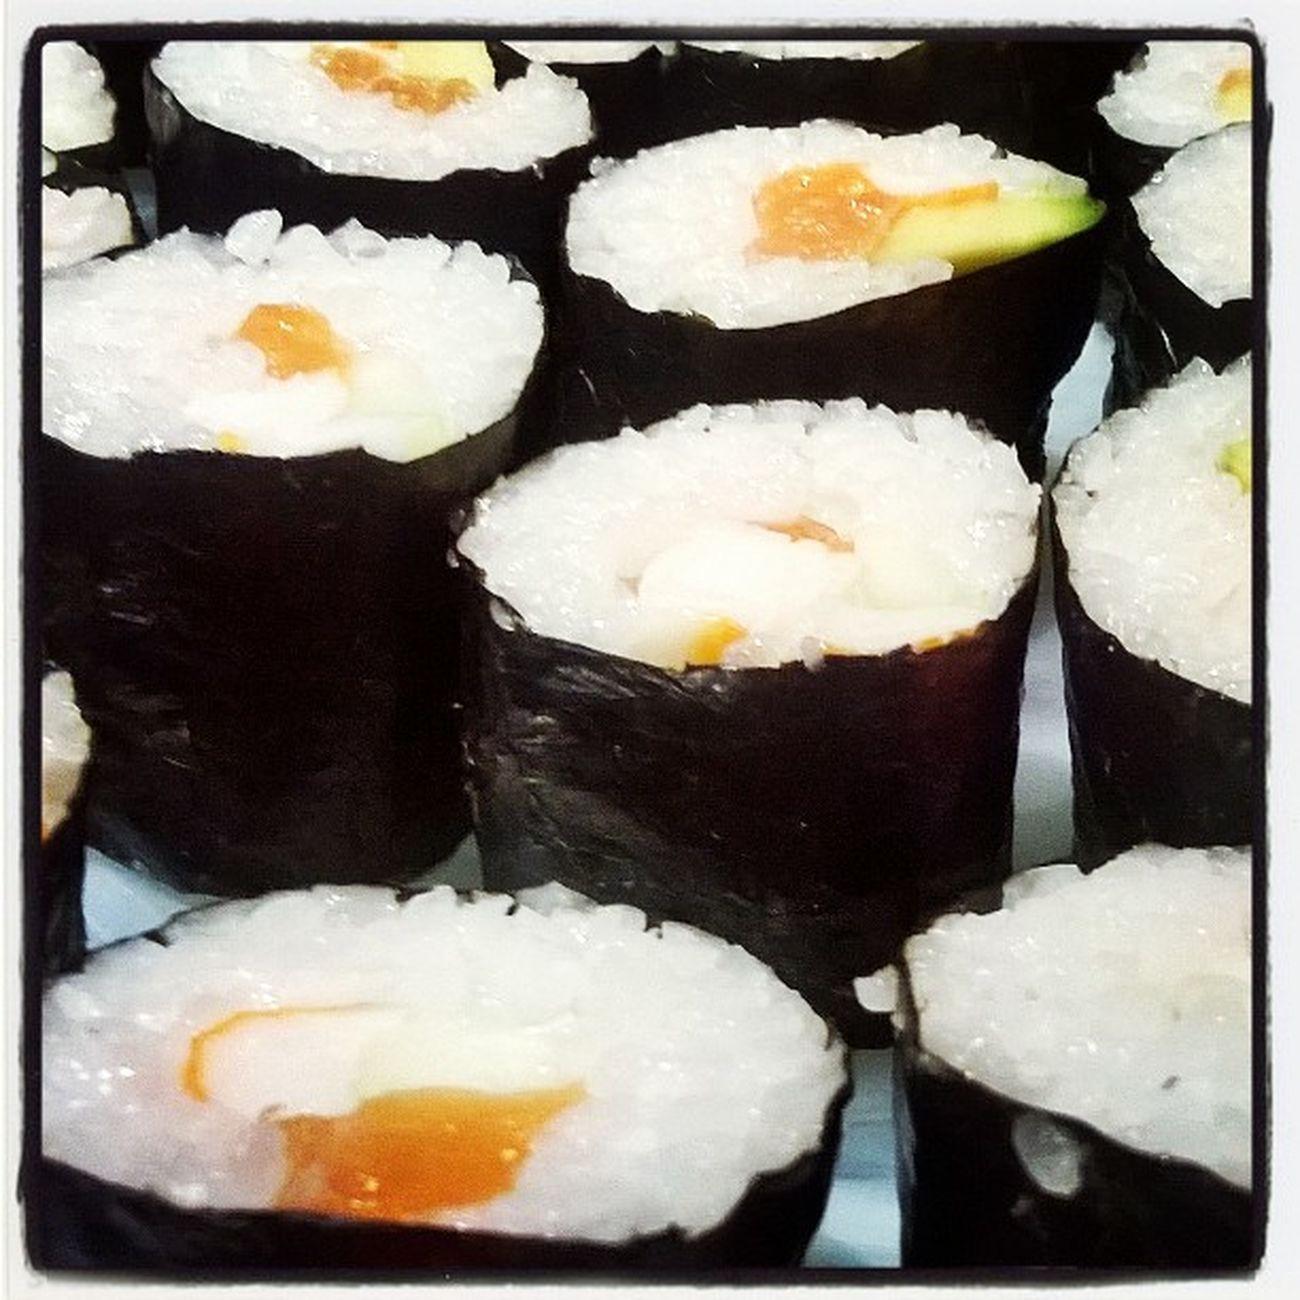 Makkis Rice Salmon Homemade Japanesefood Detail Cook